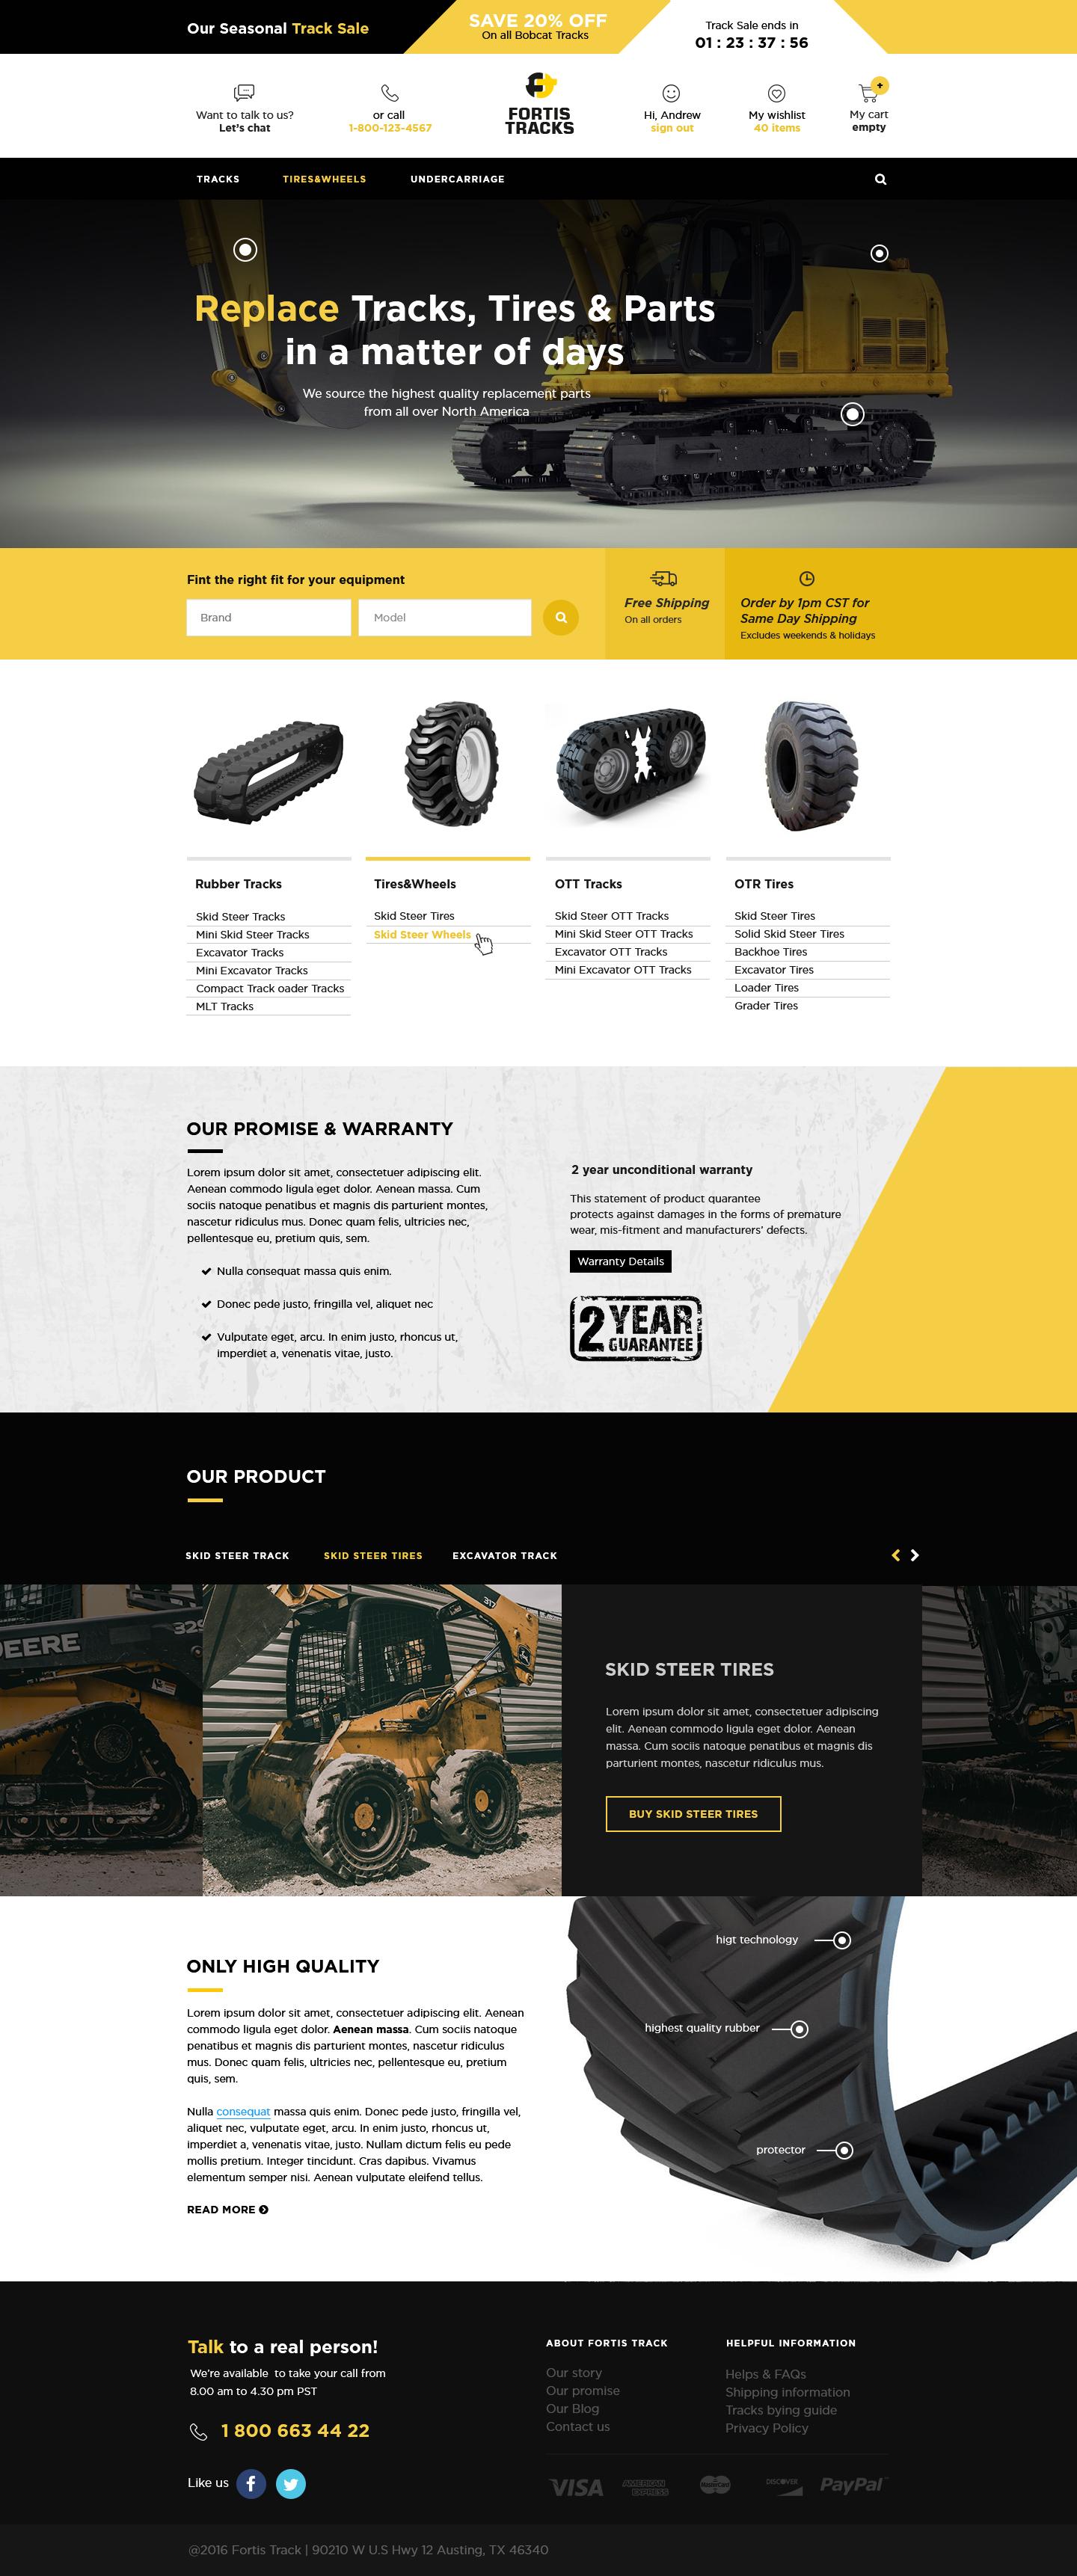 Сайт под ключ Fortis Tracks – поставки запчастей и шин для спецтехники